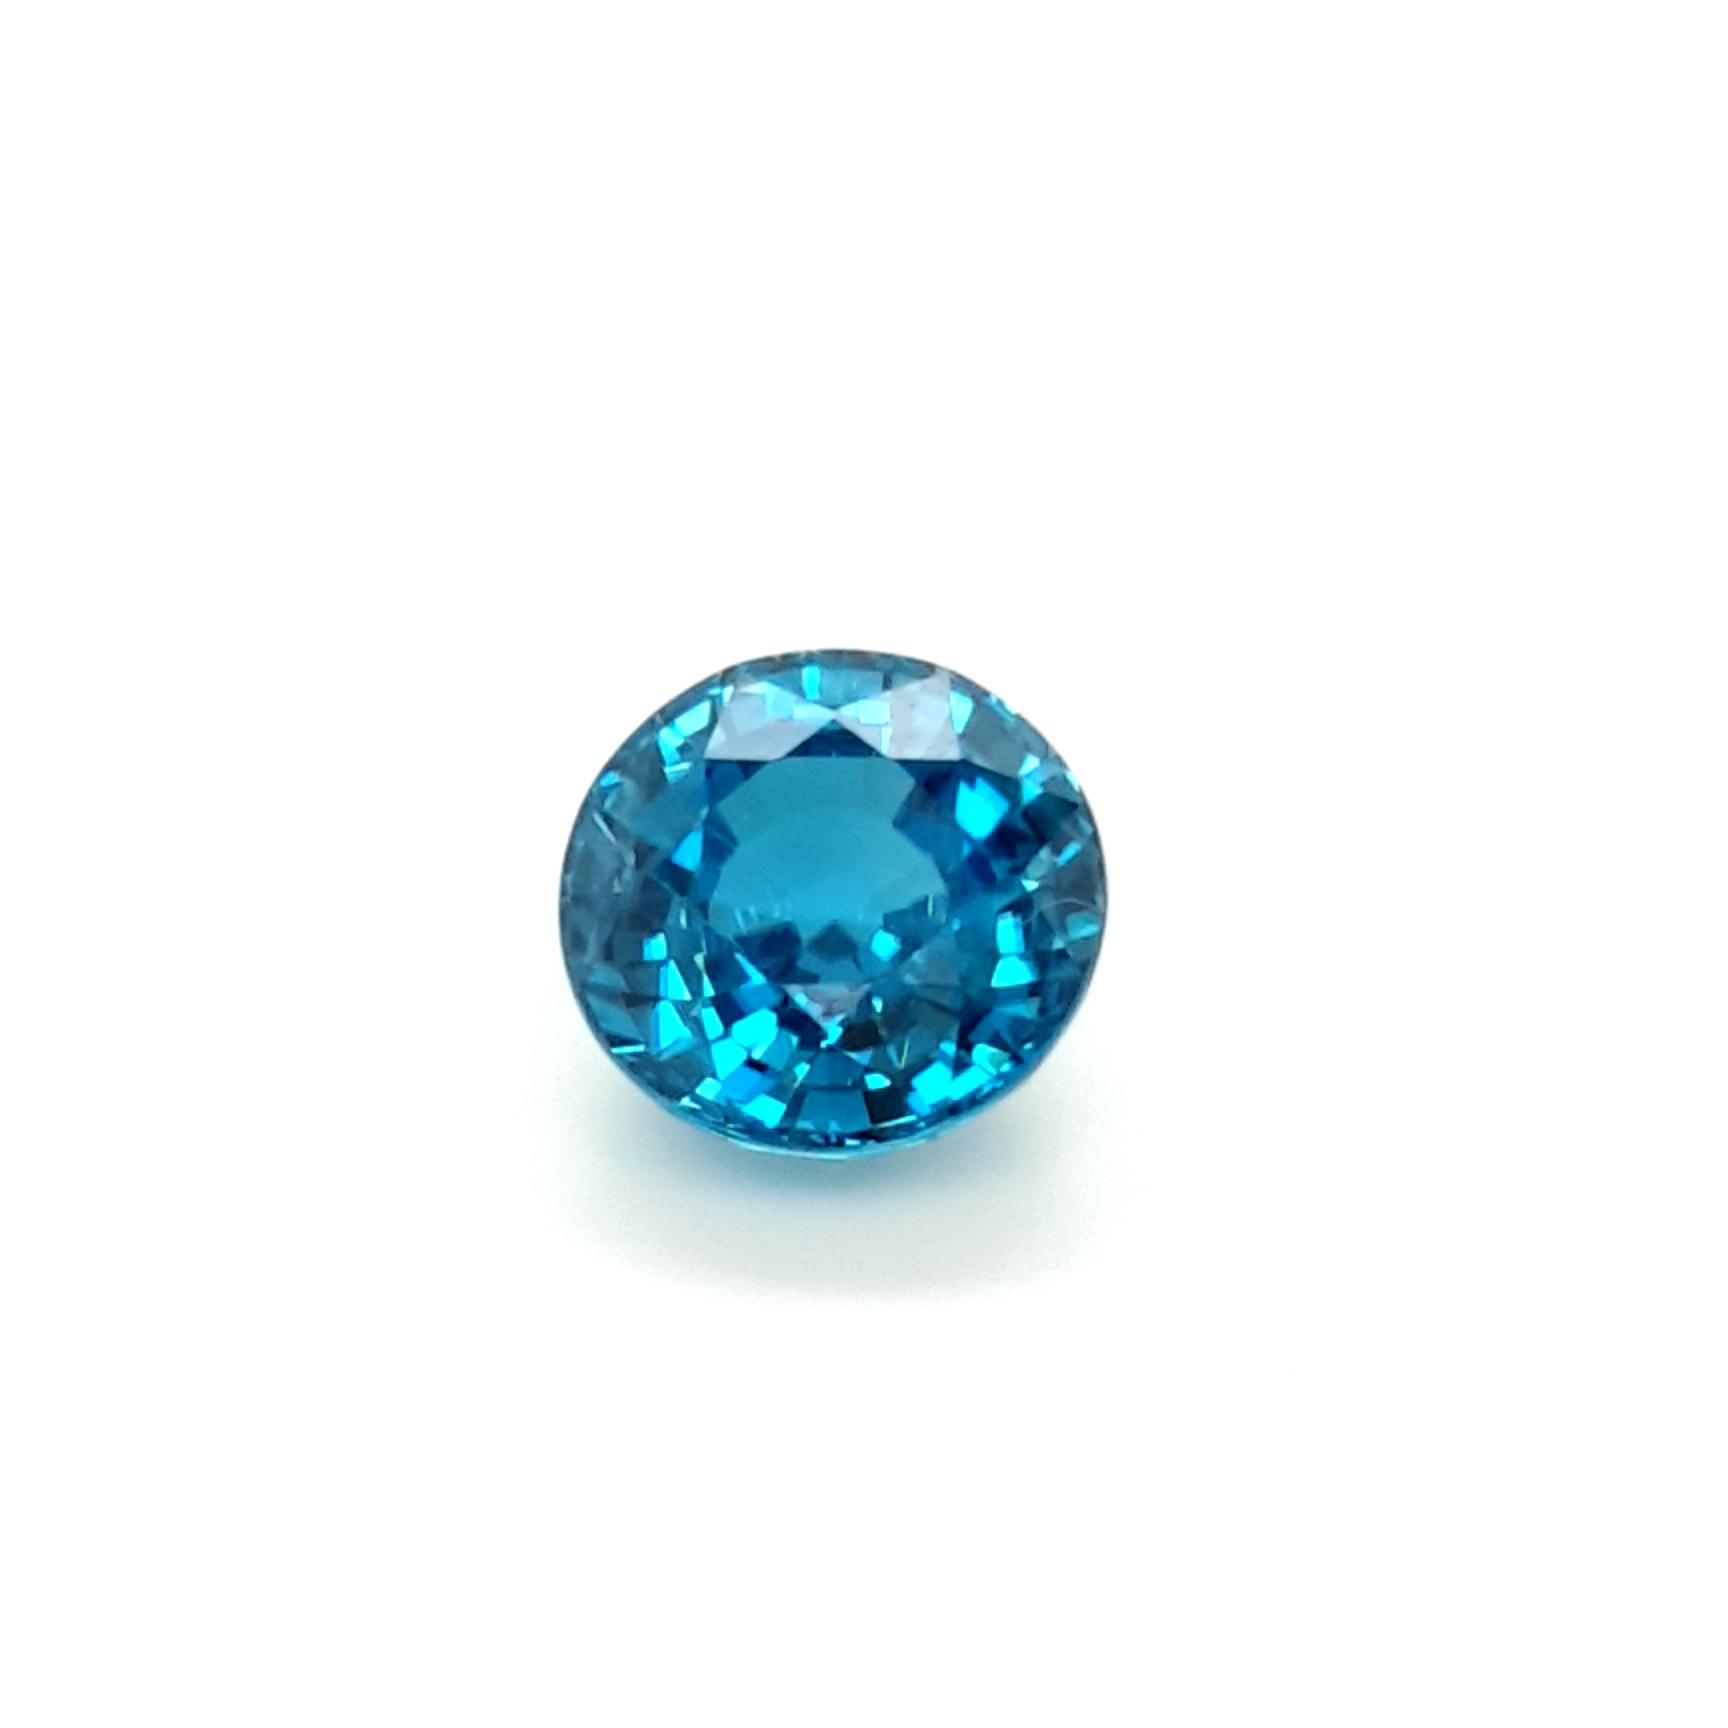 5,43ct. Round Starlight Blue Zircon ZCL20D2 ClaudiaHamann__2021-04-15-18-14-01